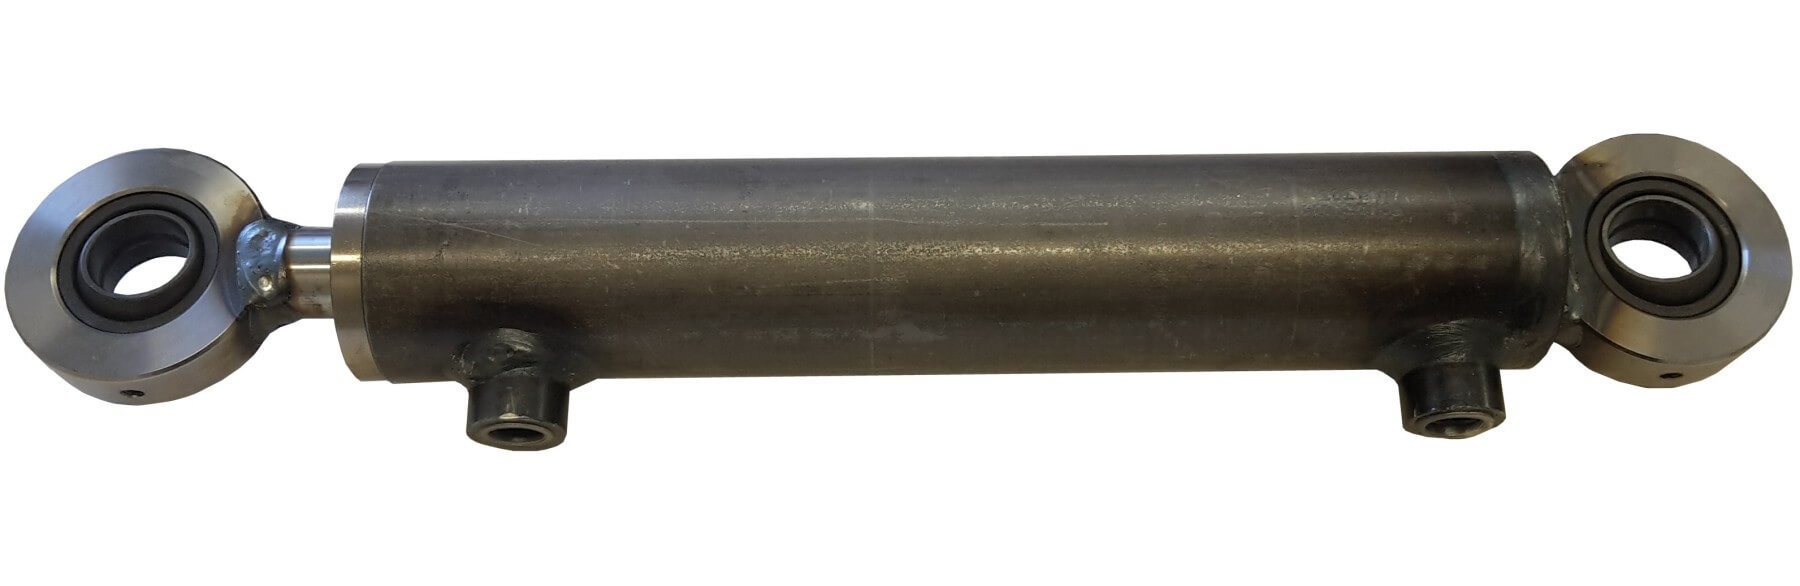 Hydraulisylinteri CL 40. 25. 400 GE